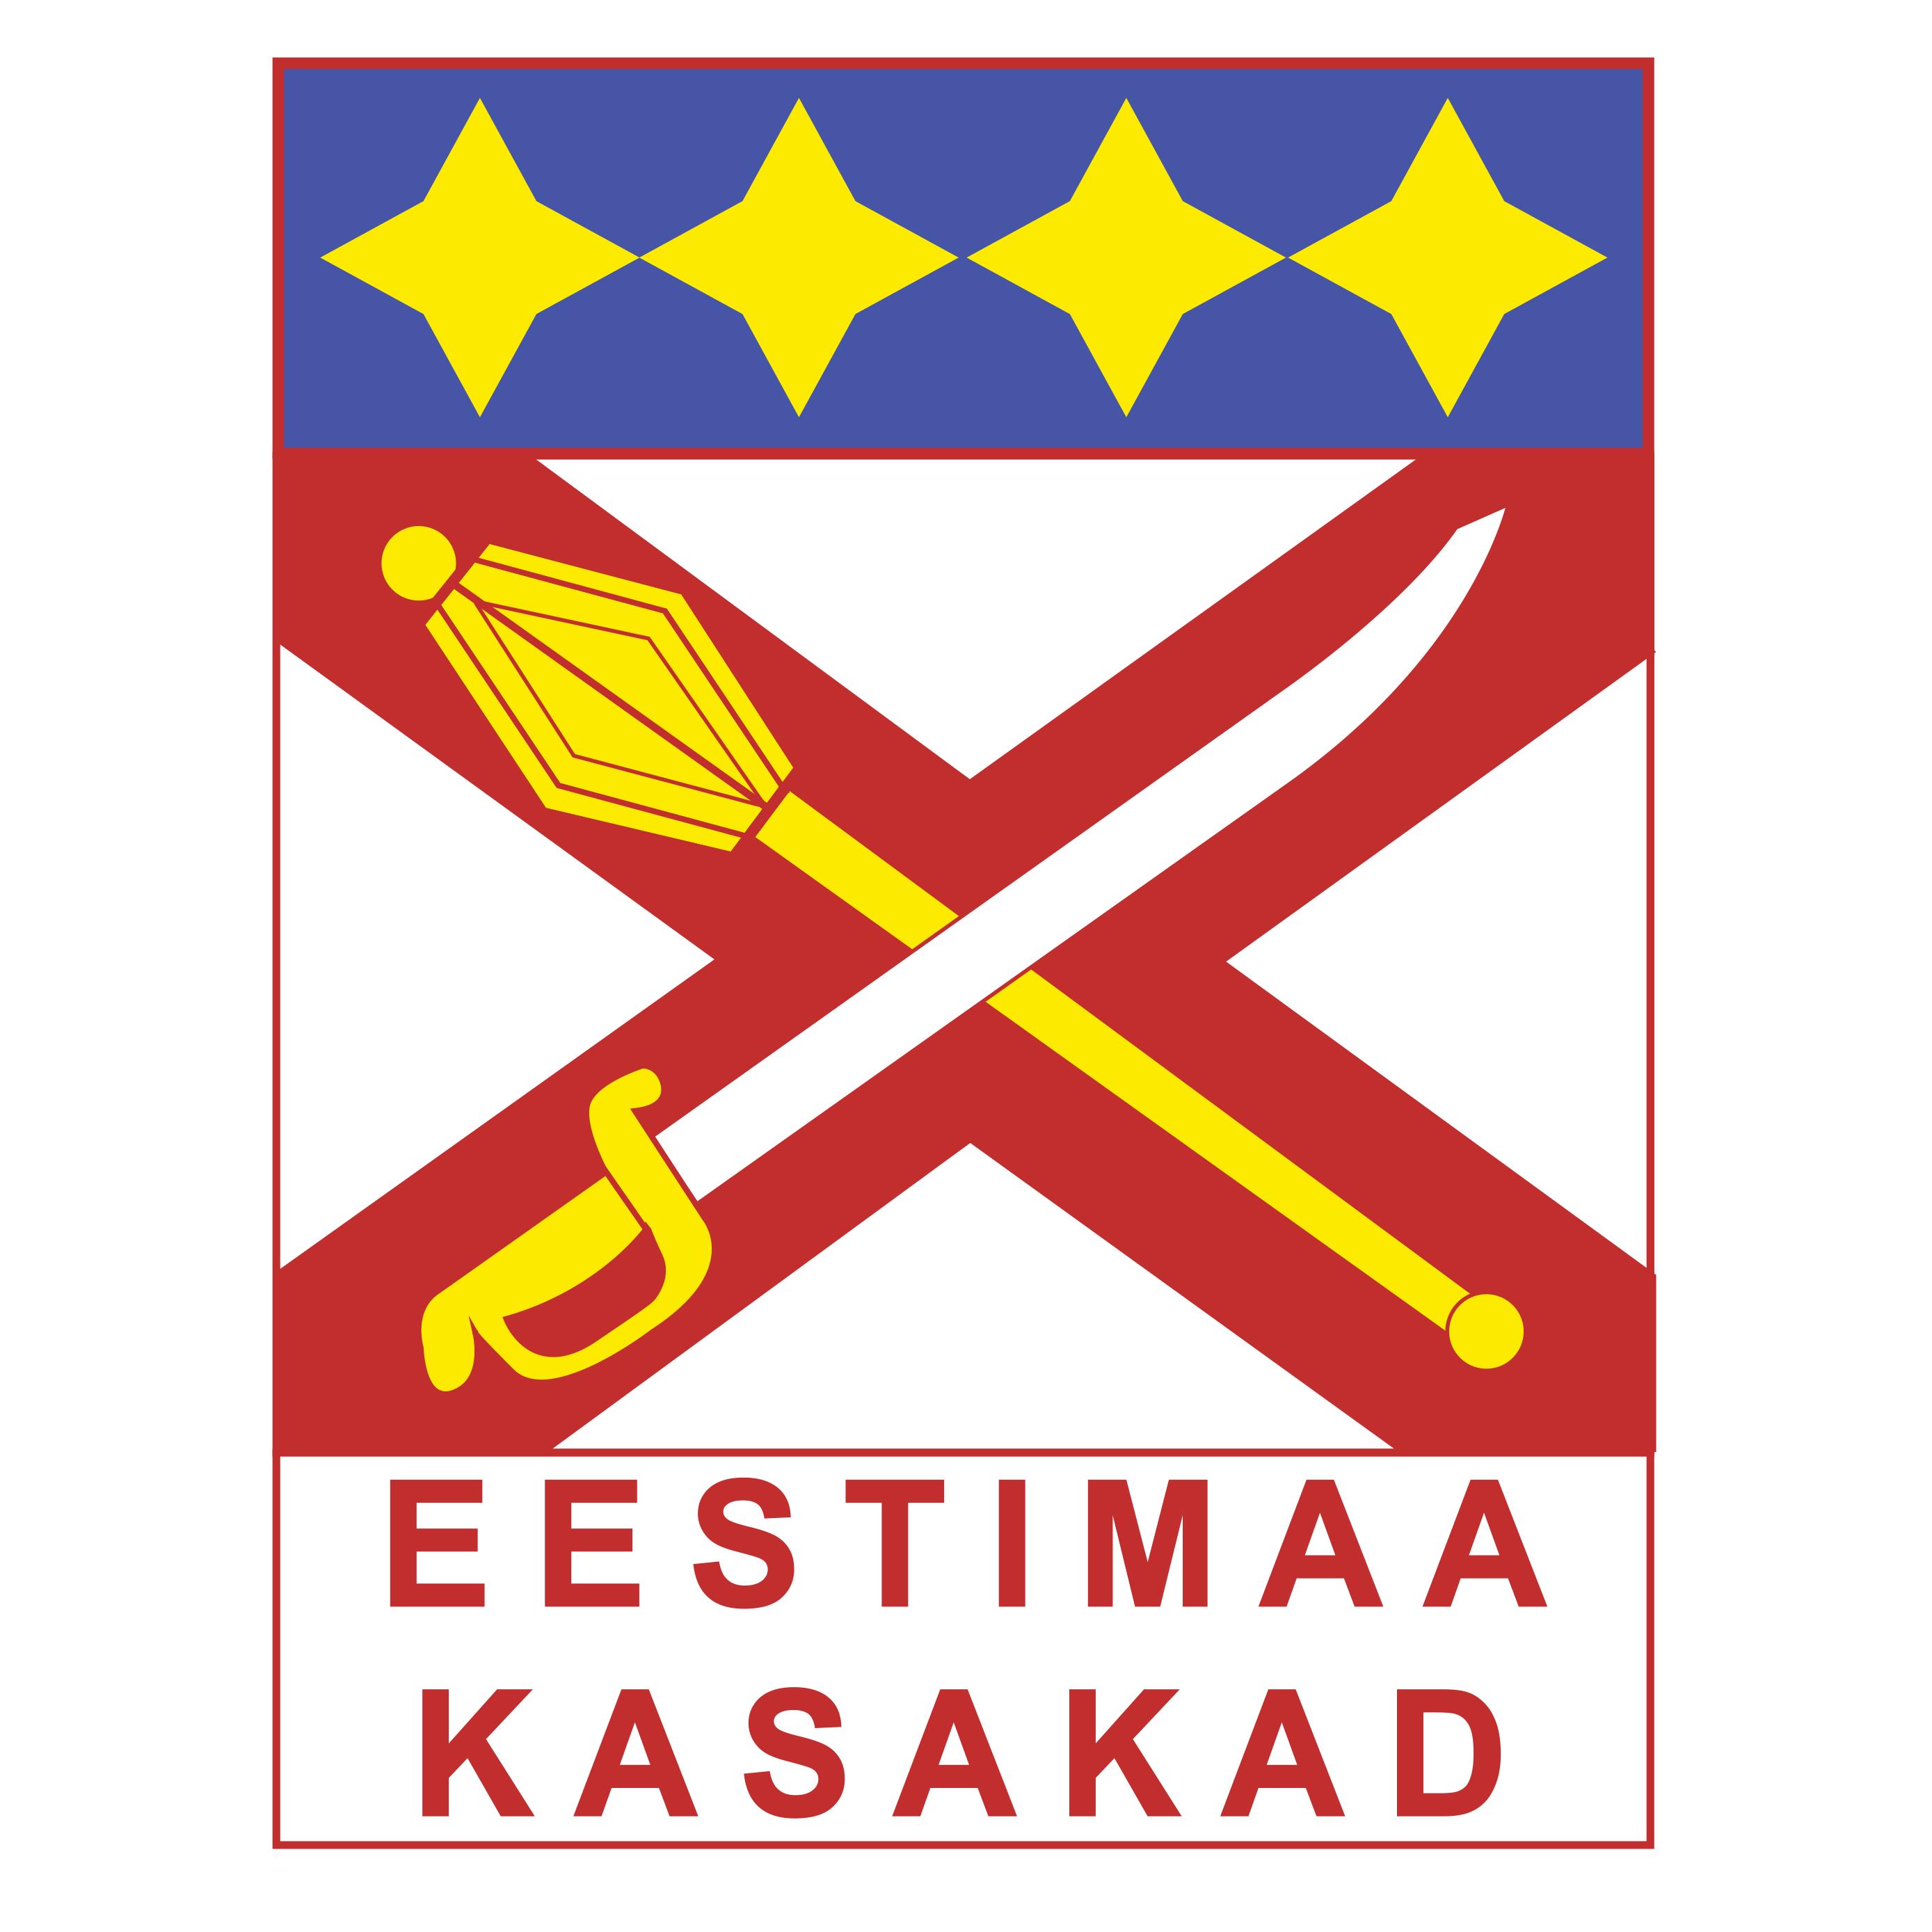 SK Eestimaa Kasakad